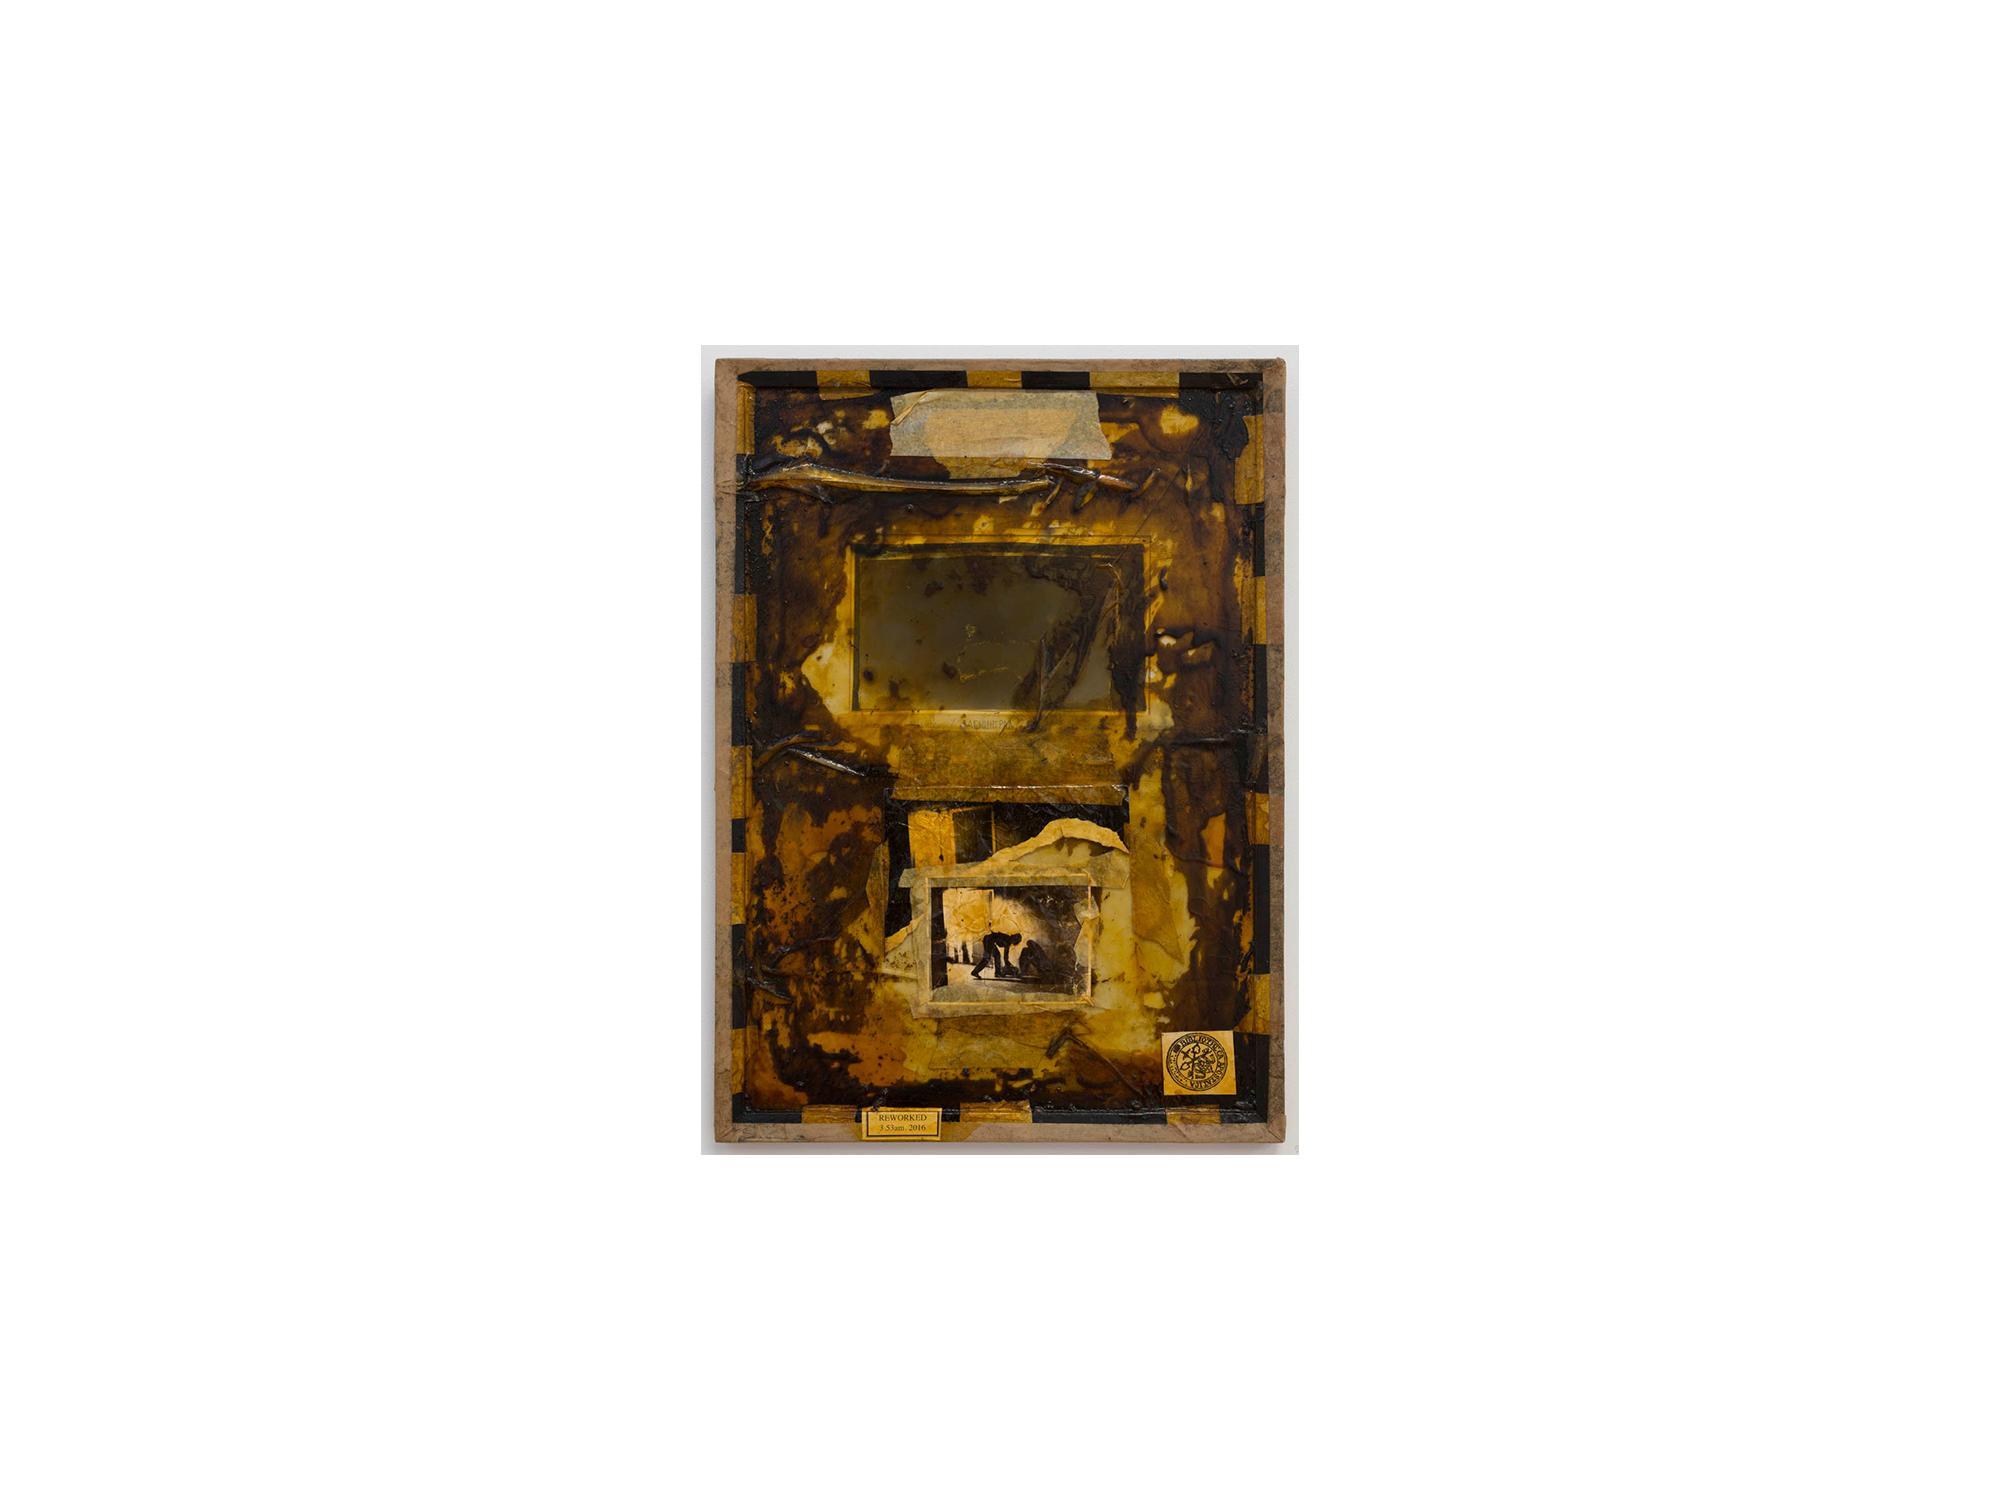 Bernhard Sachs   Untitled (Weltsinneslust) , 2016 mixed media on paper and framed glass 64 x 44c   ARTIST BIO